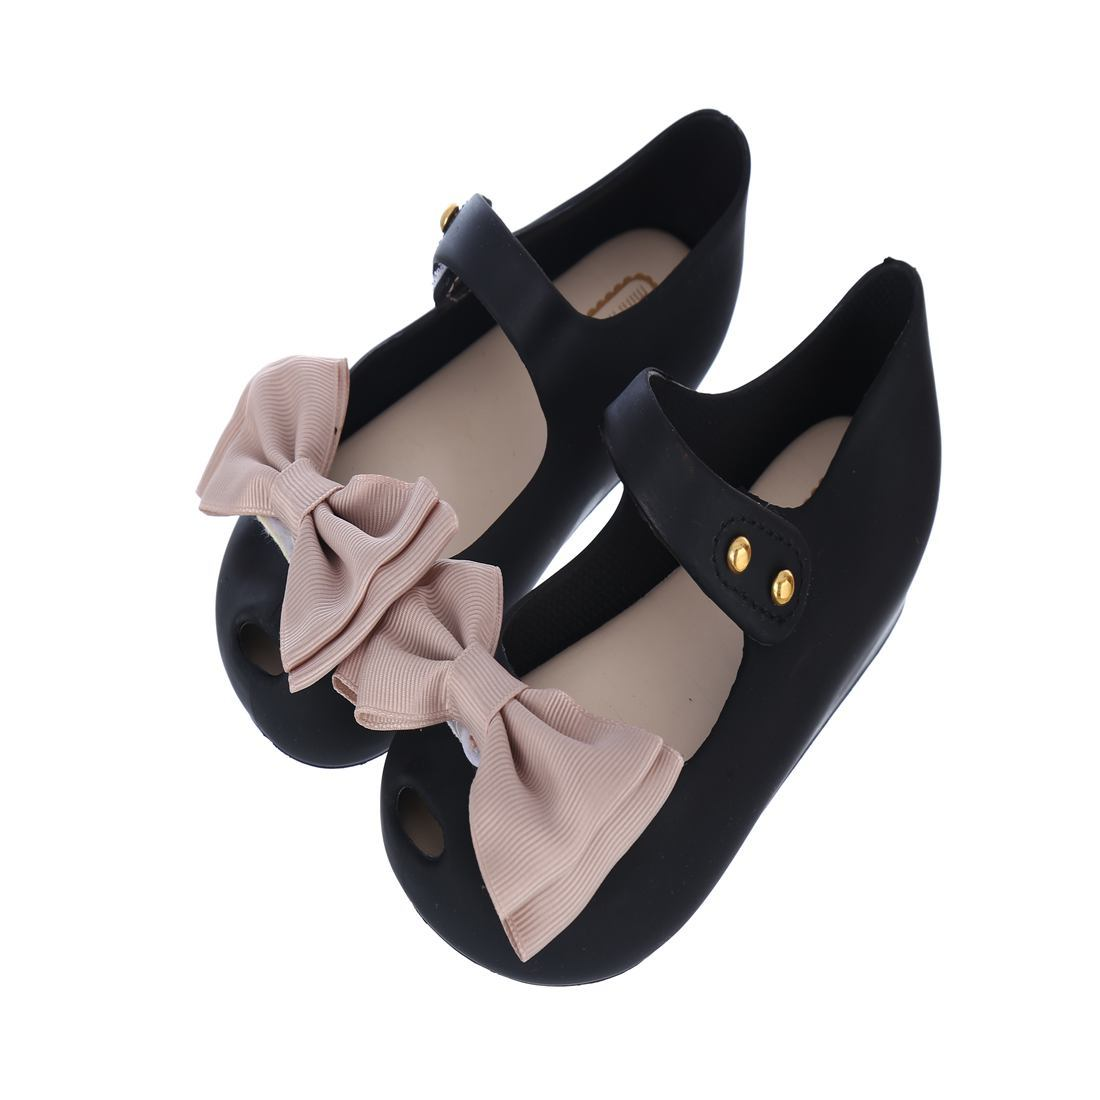 Summer 2018 Mini Melissa Girls Bigger Size Shoes Kids Rain Shoes Color Bow Rubber Cute Sandal Buckle Slipper Fruit Jelly